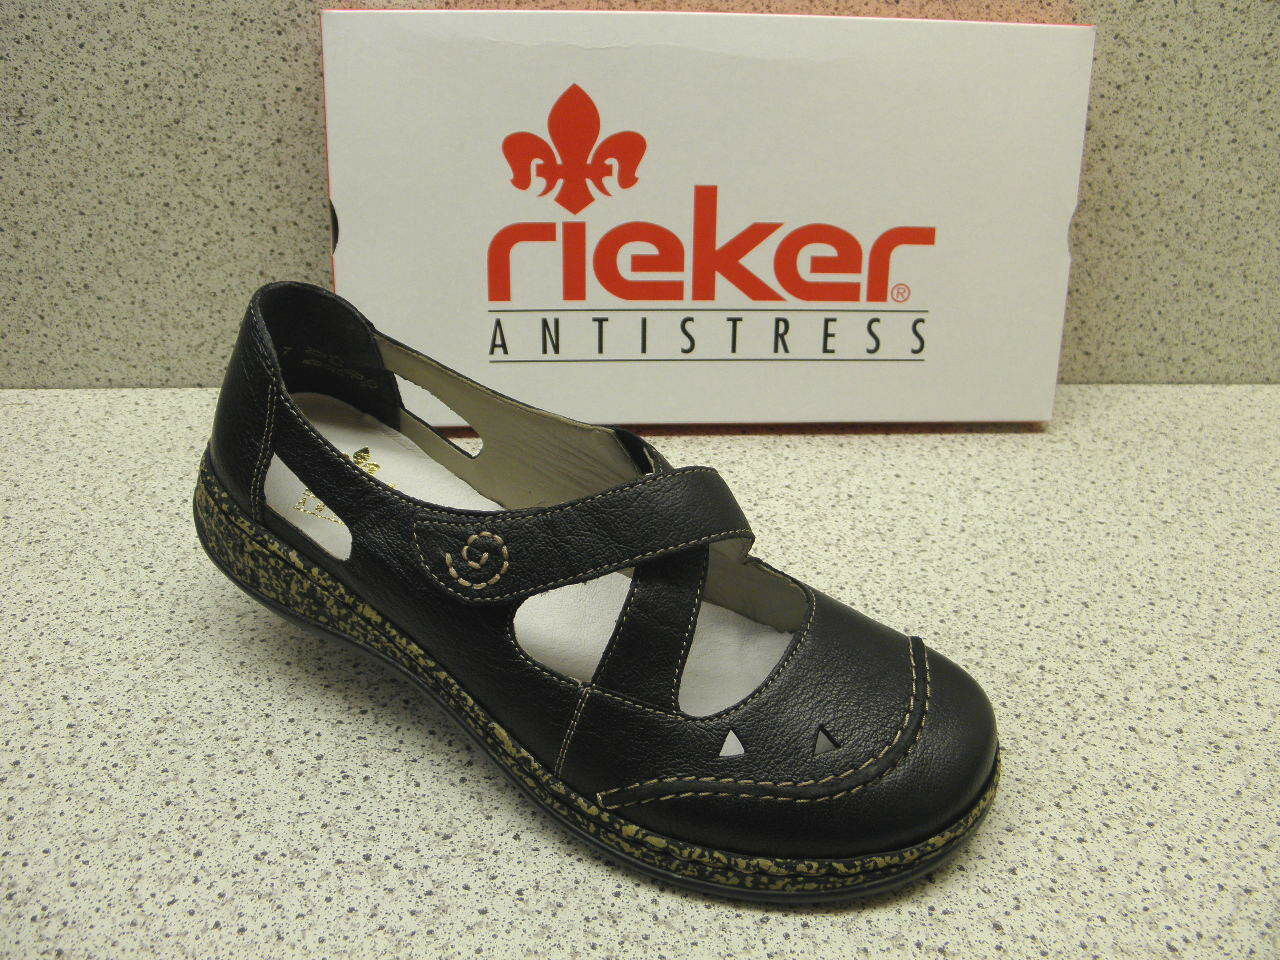 Rieker®   ROTuziert  Slipper schwarz superbequem  Rieker® 46335-00 (R335) 5c6631